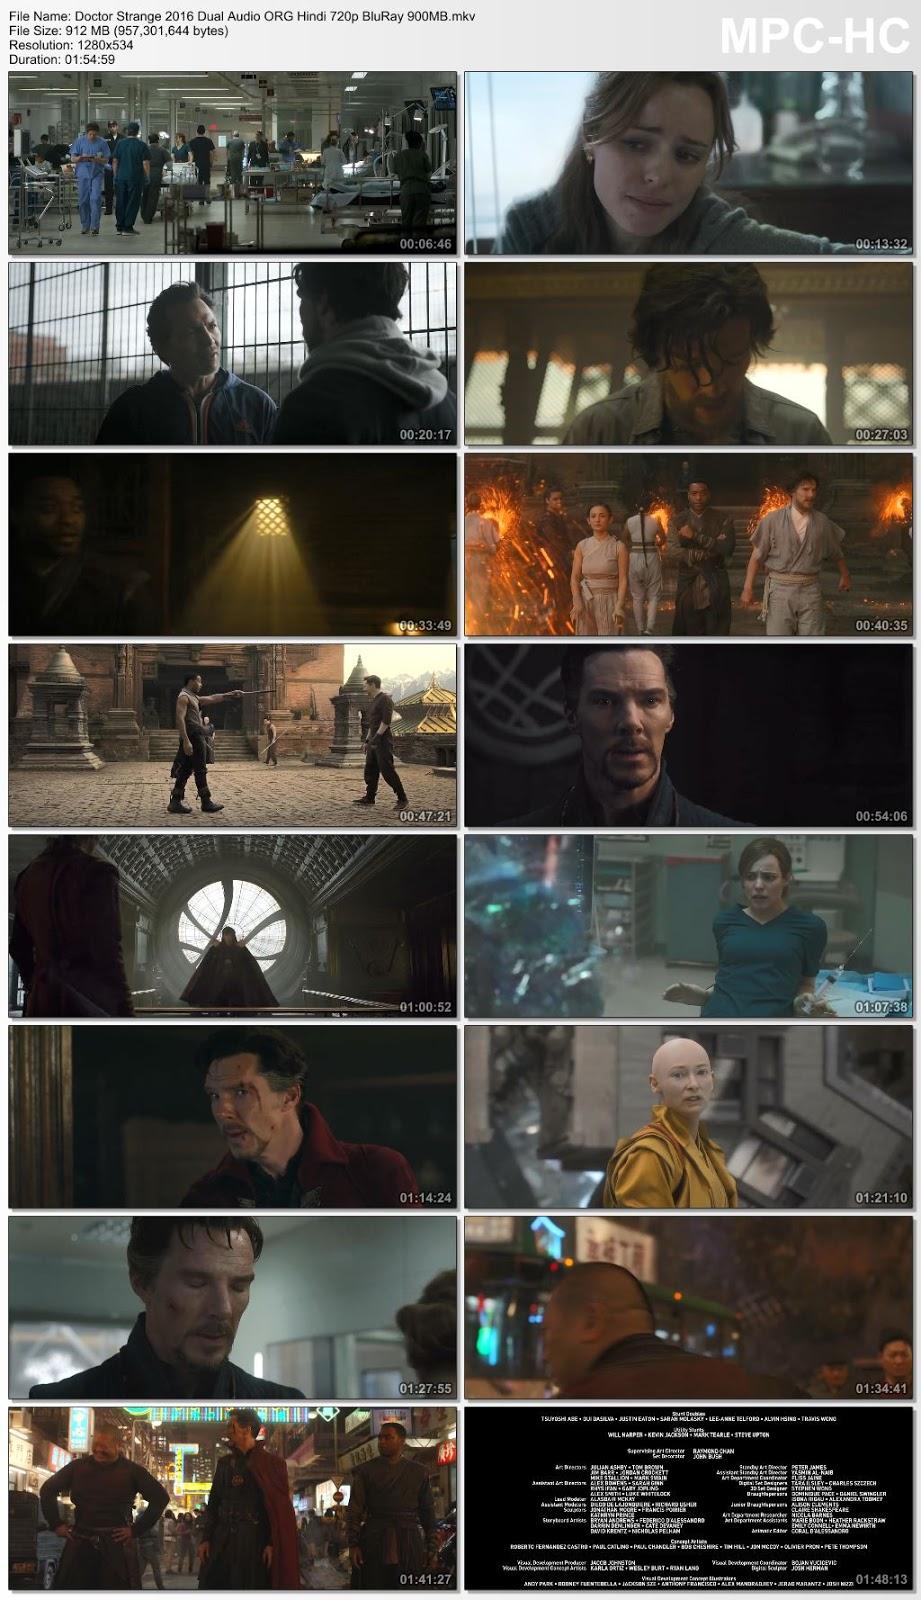 Doctor Strange 2016 Dual Audio ORG Hindi 720p BluRay 900MB Desirehub